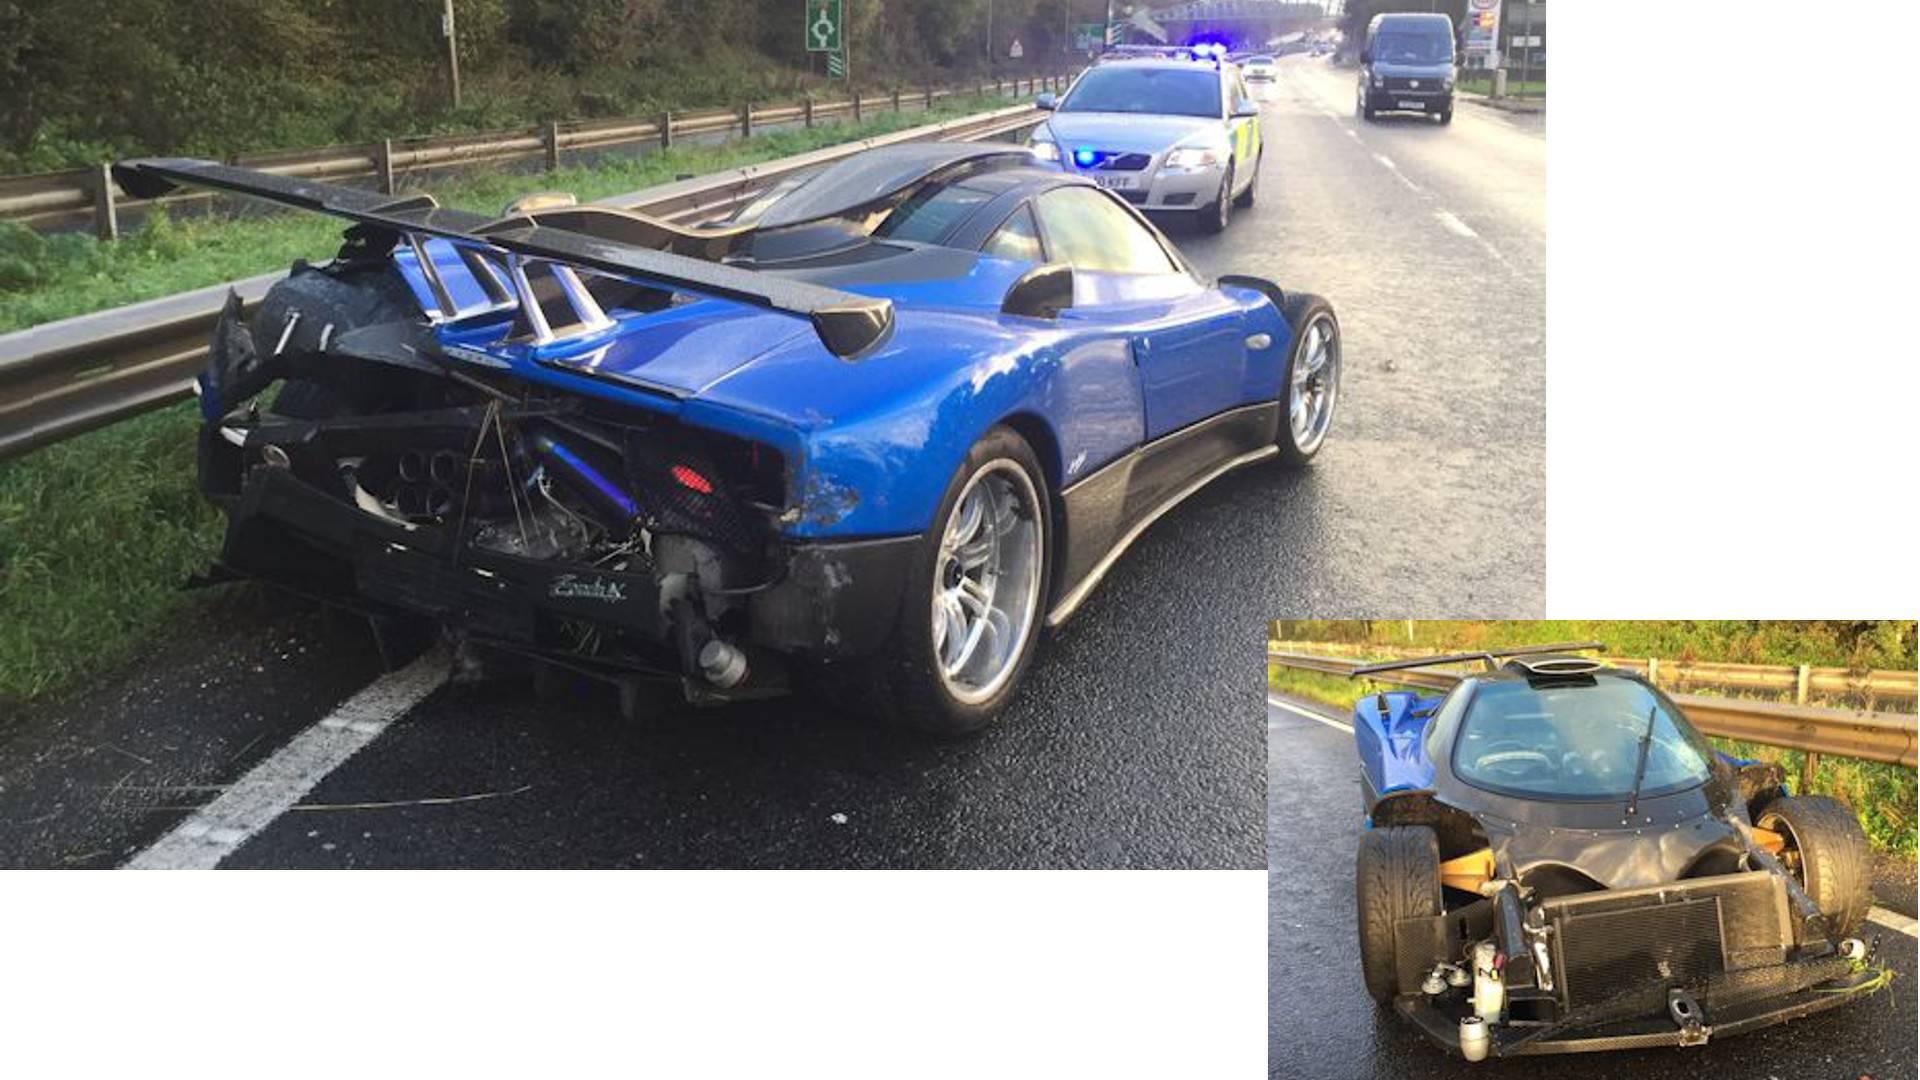 Sus police investigating £1.5m Pagani Zonda crash